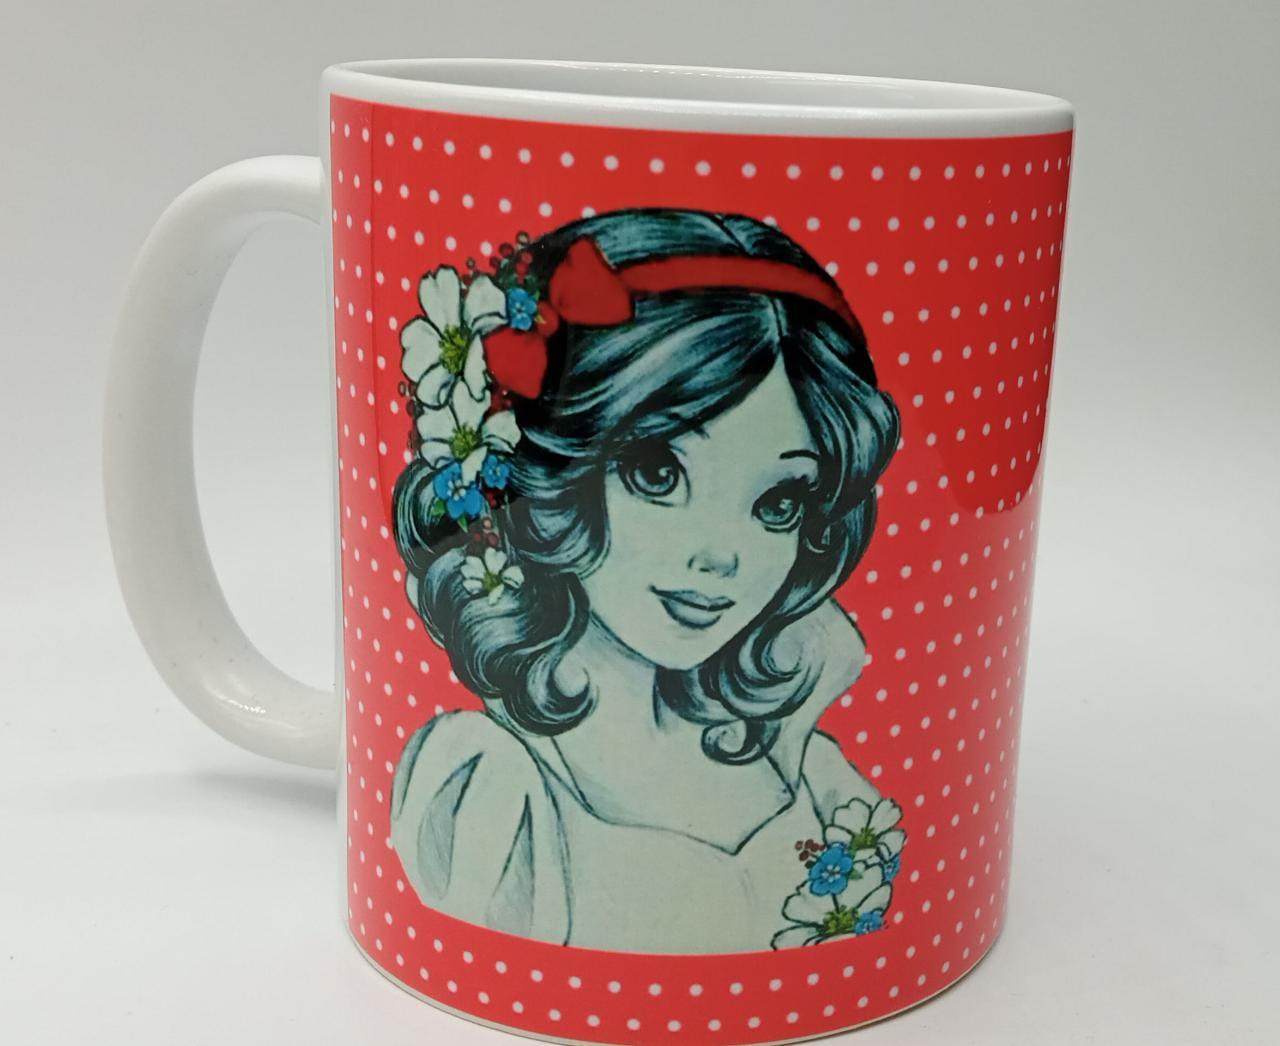 Caneca ''Princesa Branca De Neve'' - Disney (Branca)